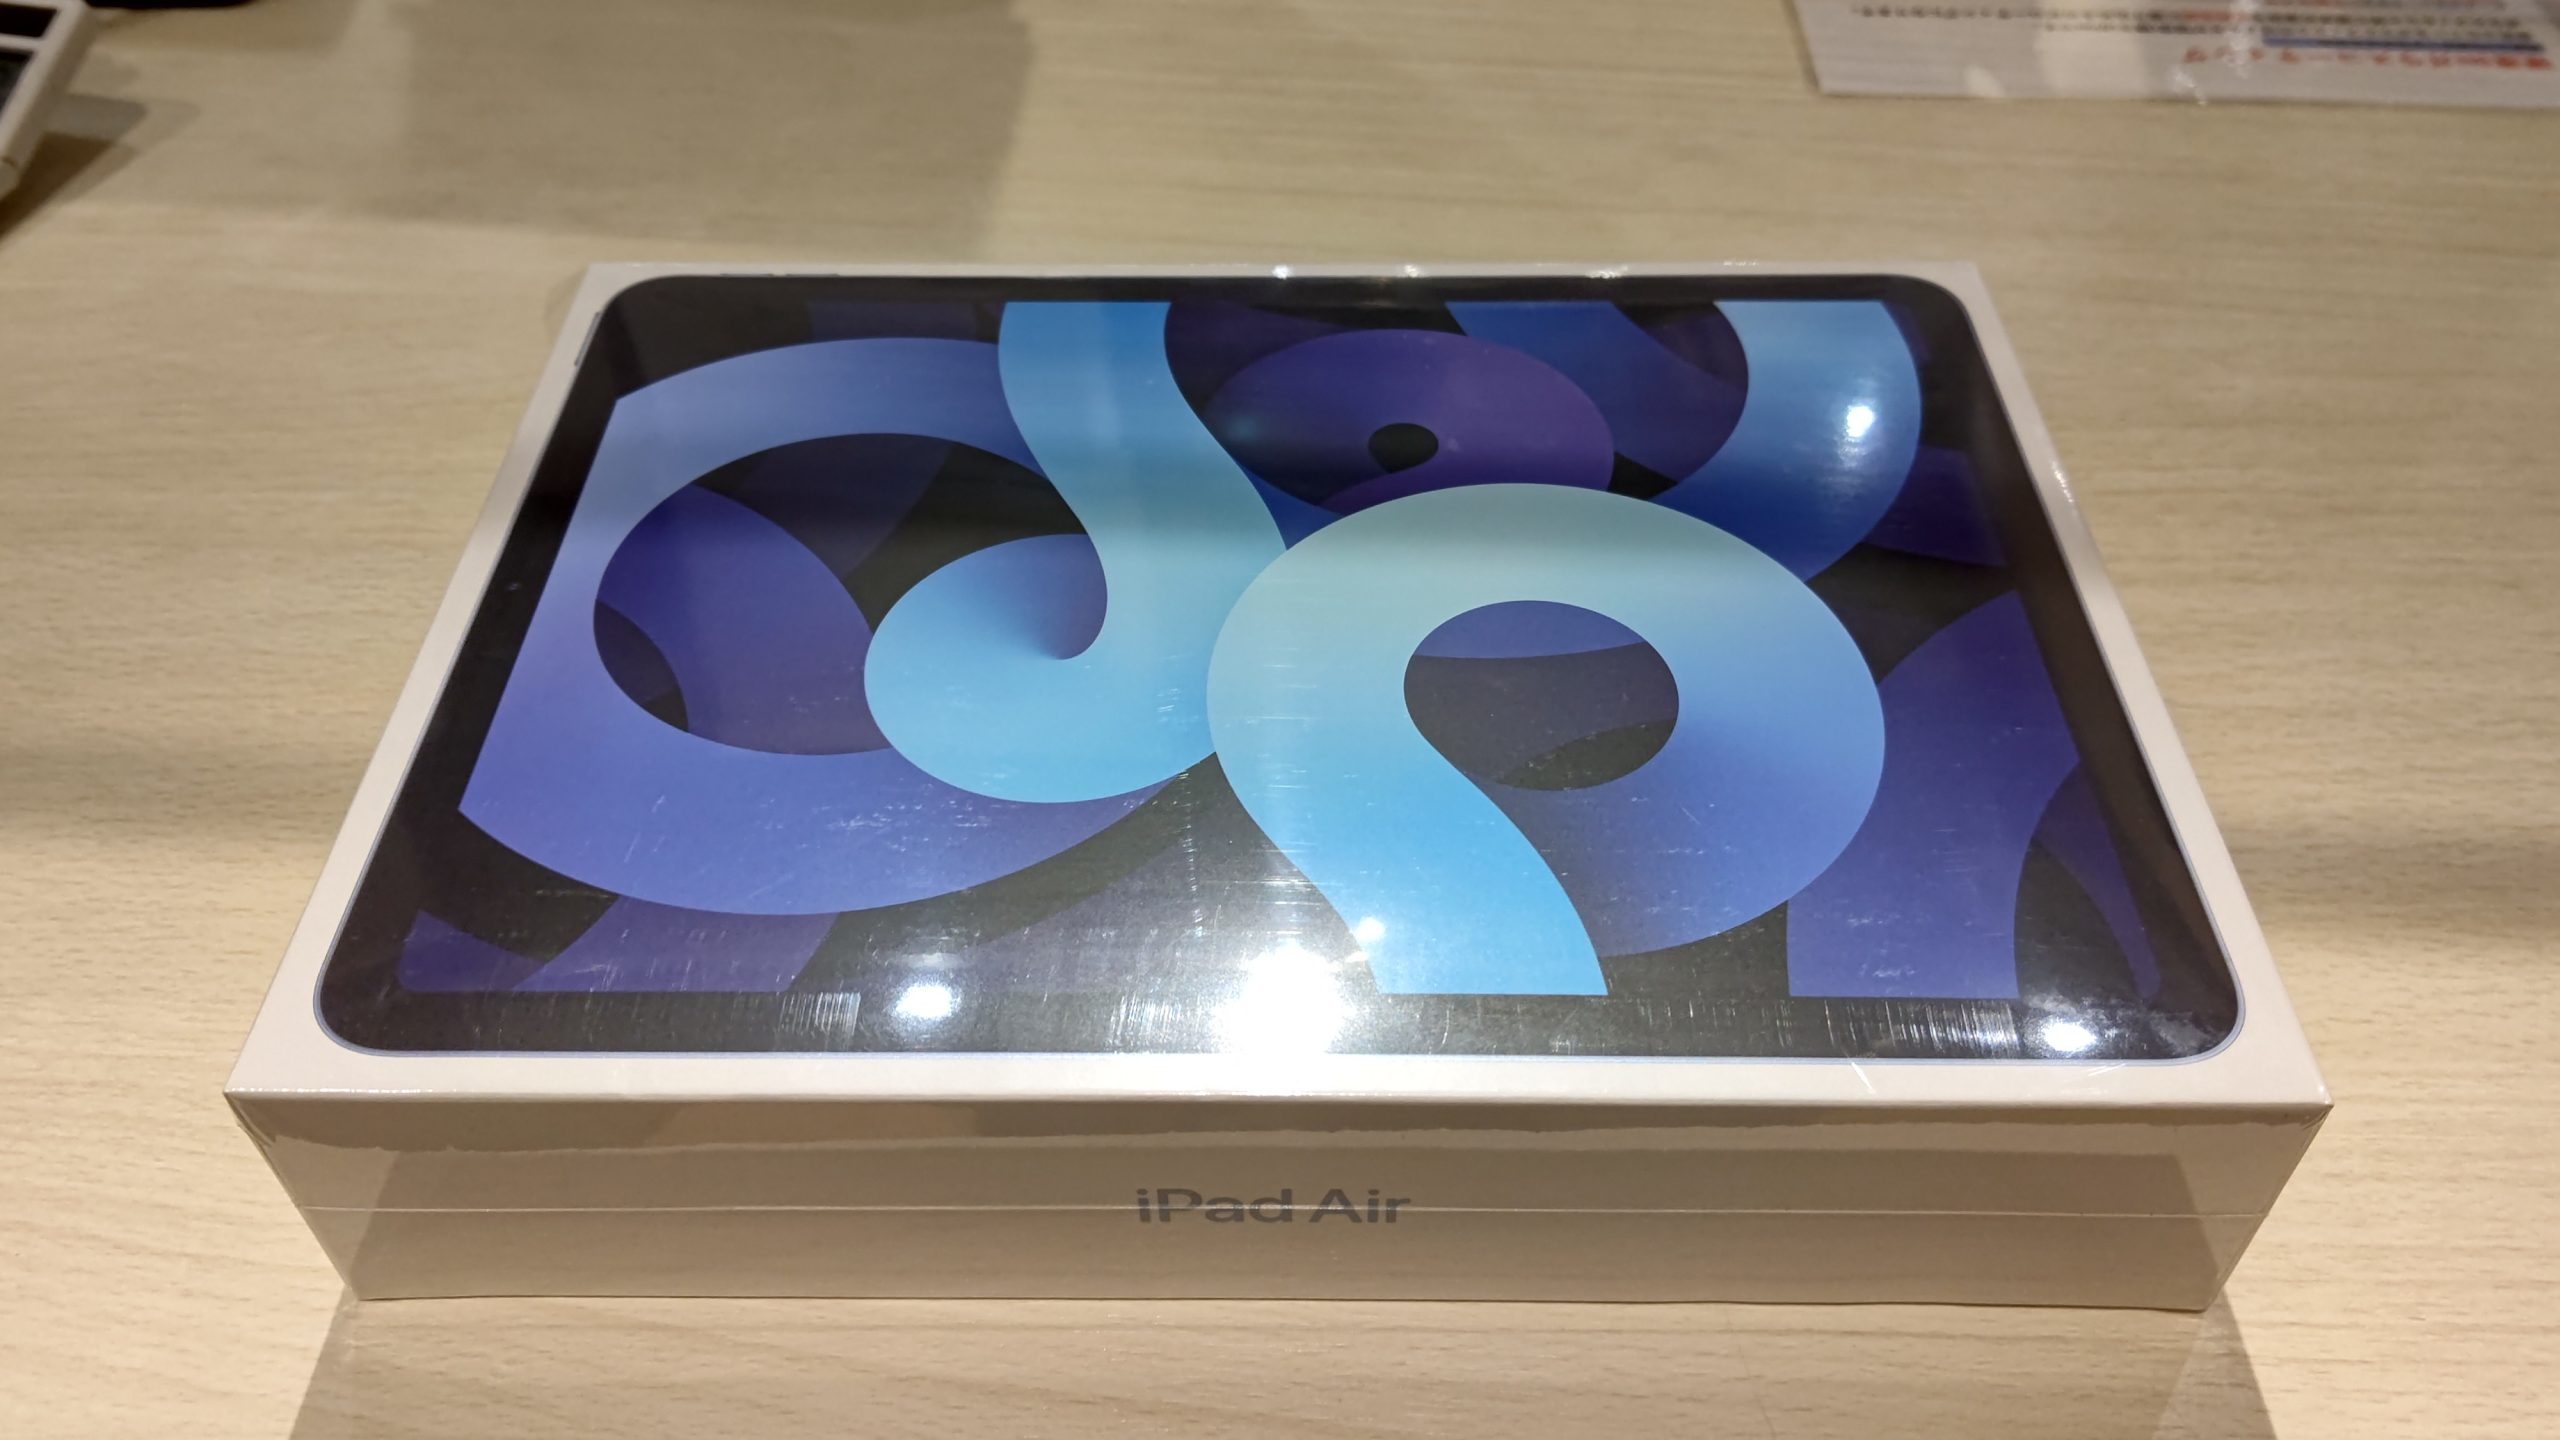 iPadAir4 Wi-Fiモデル SIMフリー 64GBスカイブルー 新品未開封